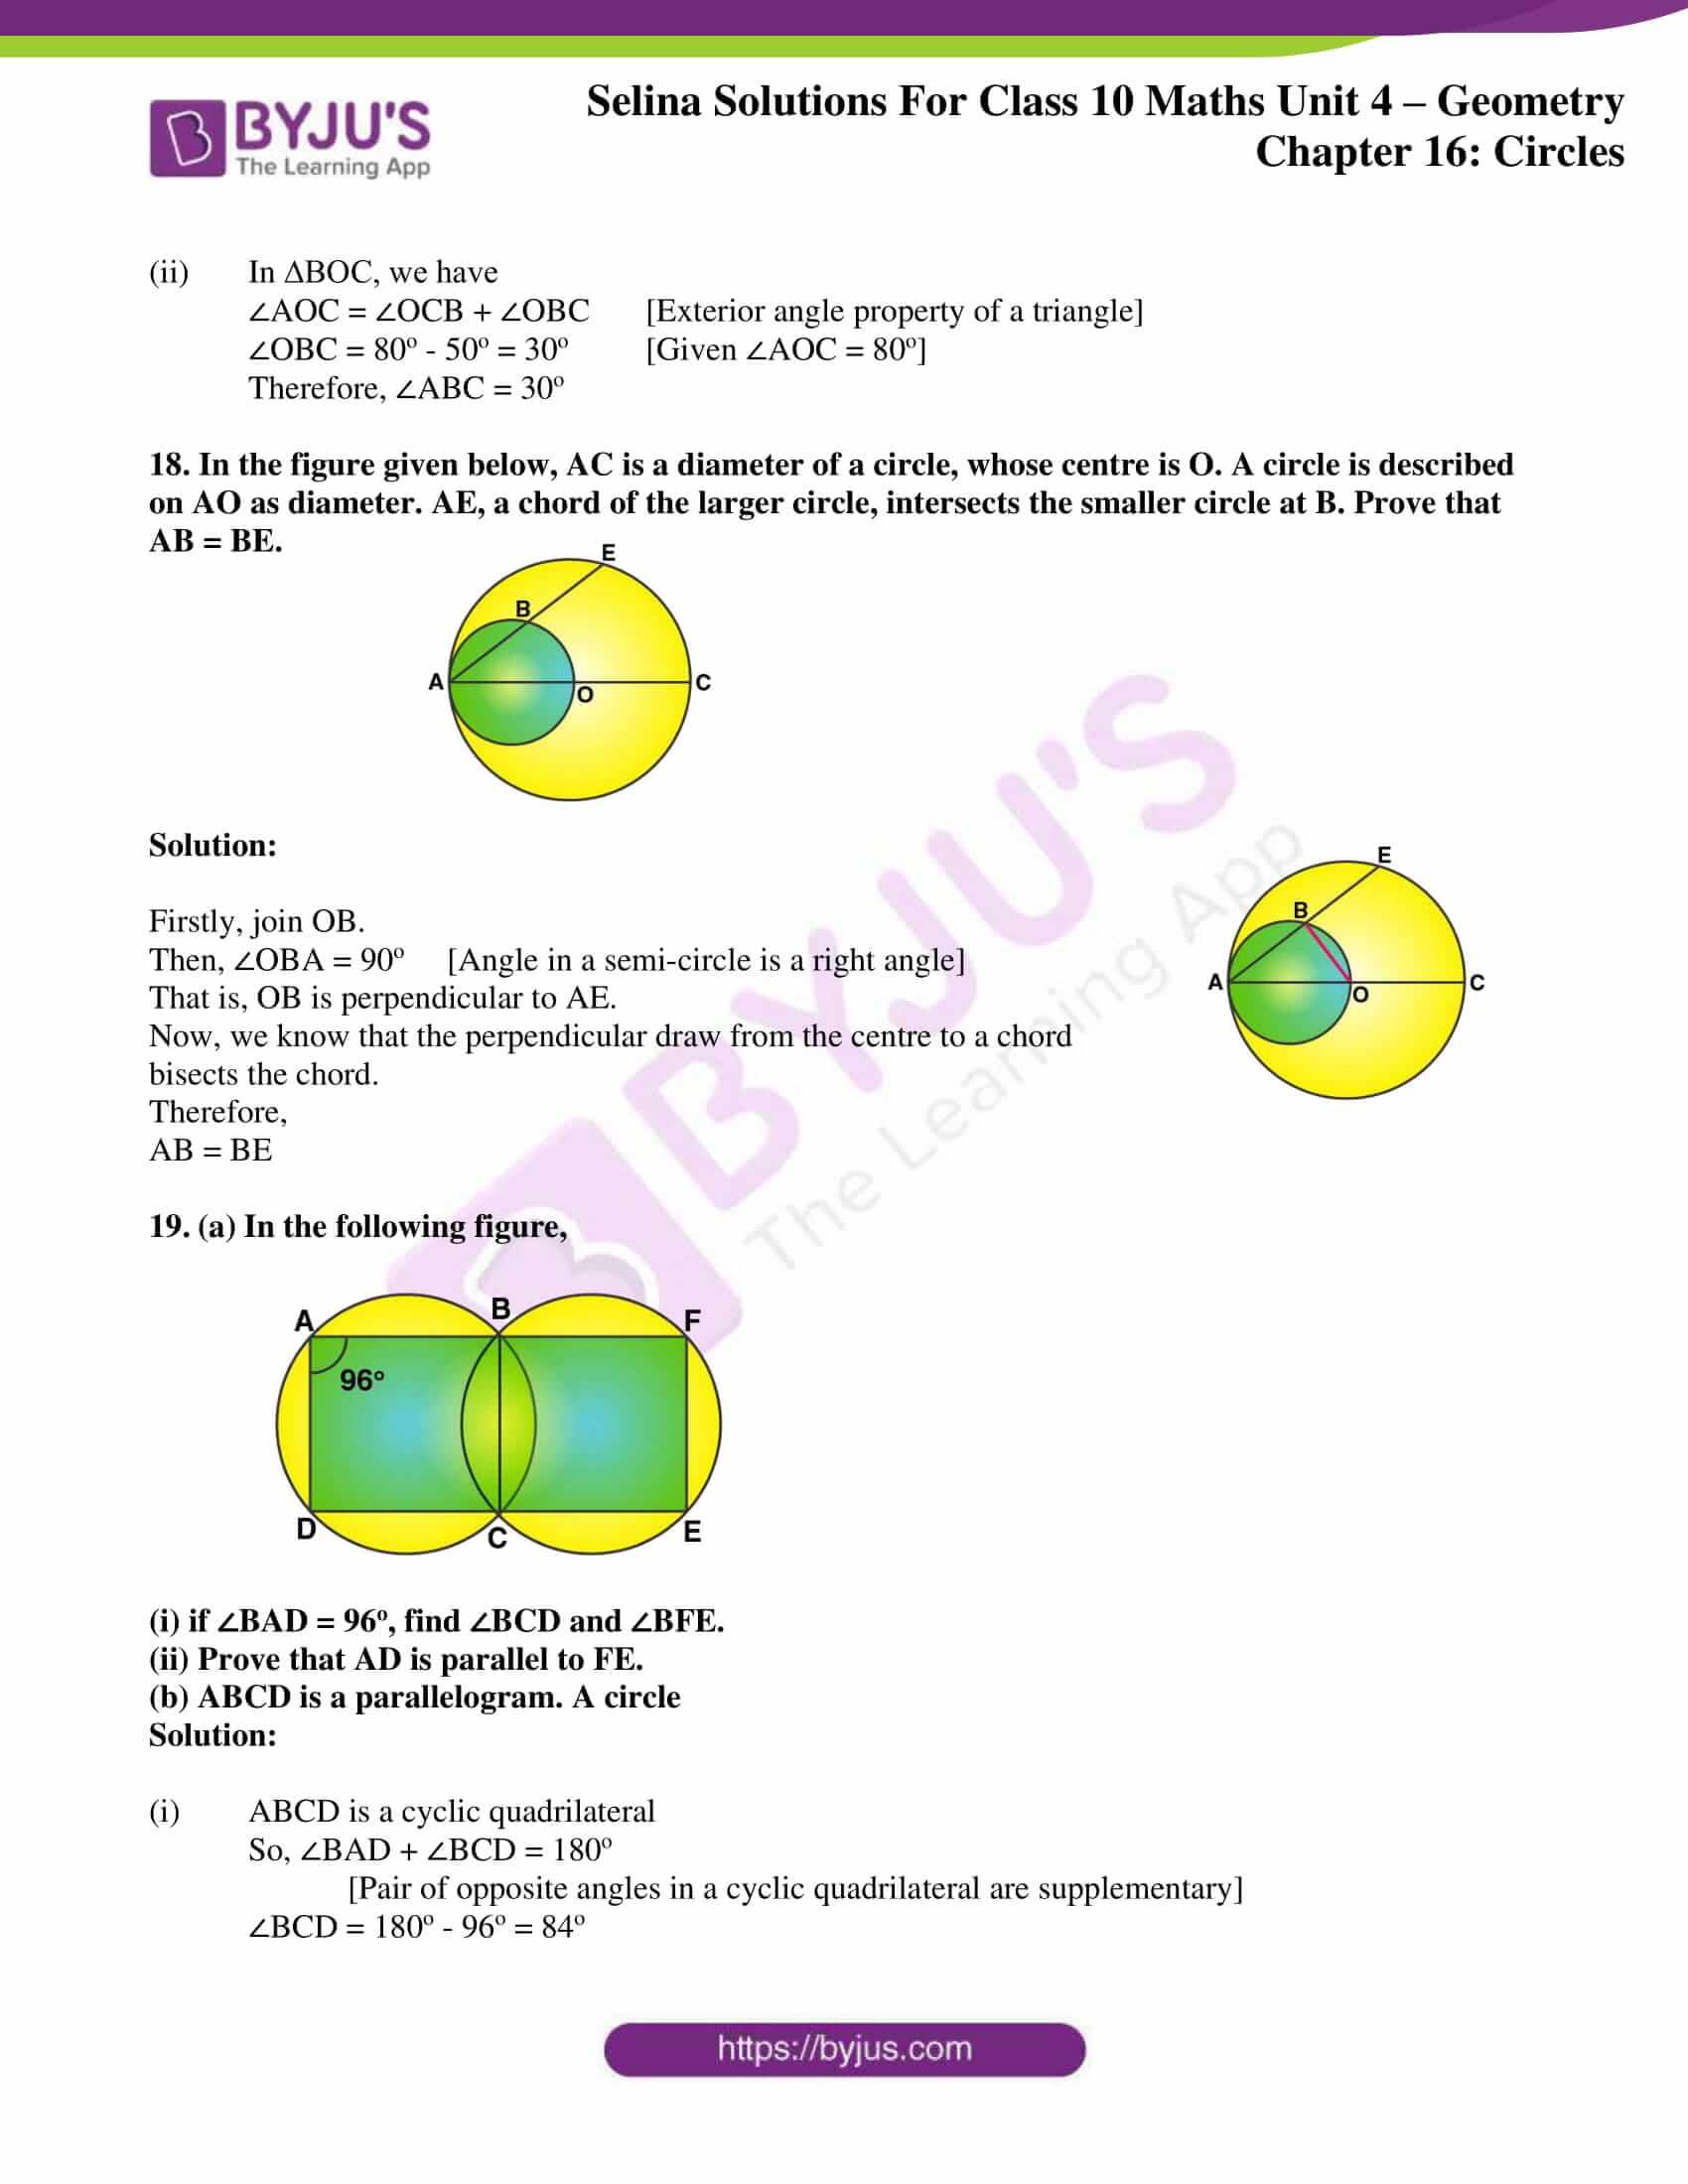 selina-sol-maths-class-10-ch-17-ex-a-10